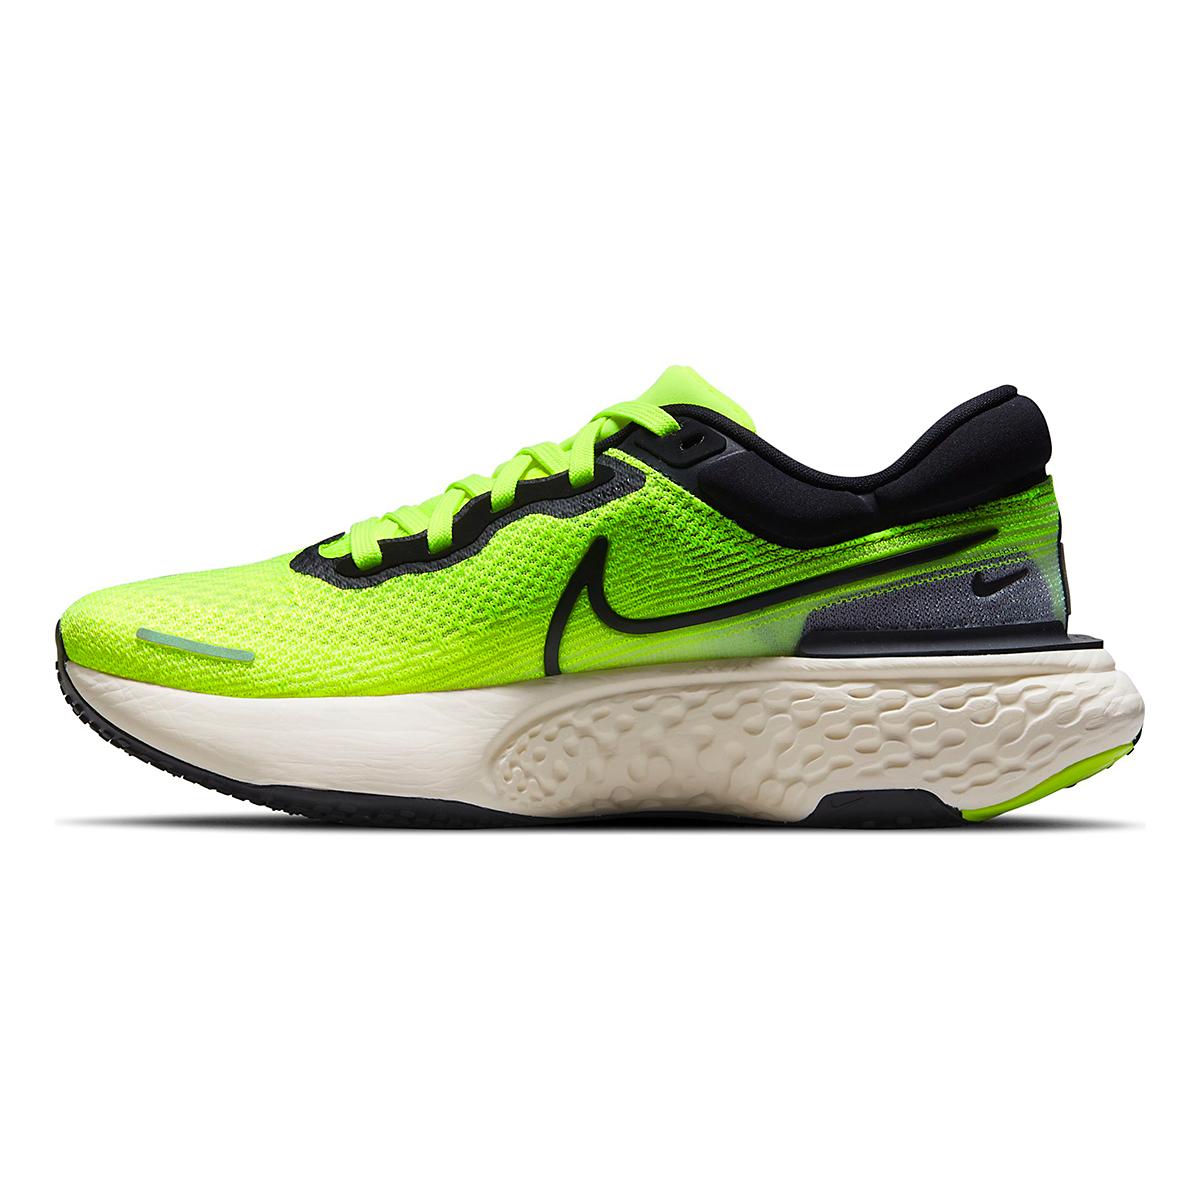 Men's Nike Zoomx Invincible Run FlyKnit Running Shoe - Color: Volt/Black/Barely Volt - Size: 6 - Width: Regular, Volt/Black/Barely Volt, large, image 2